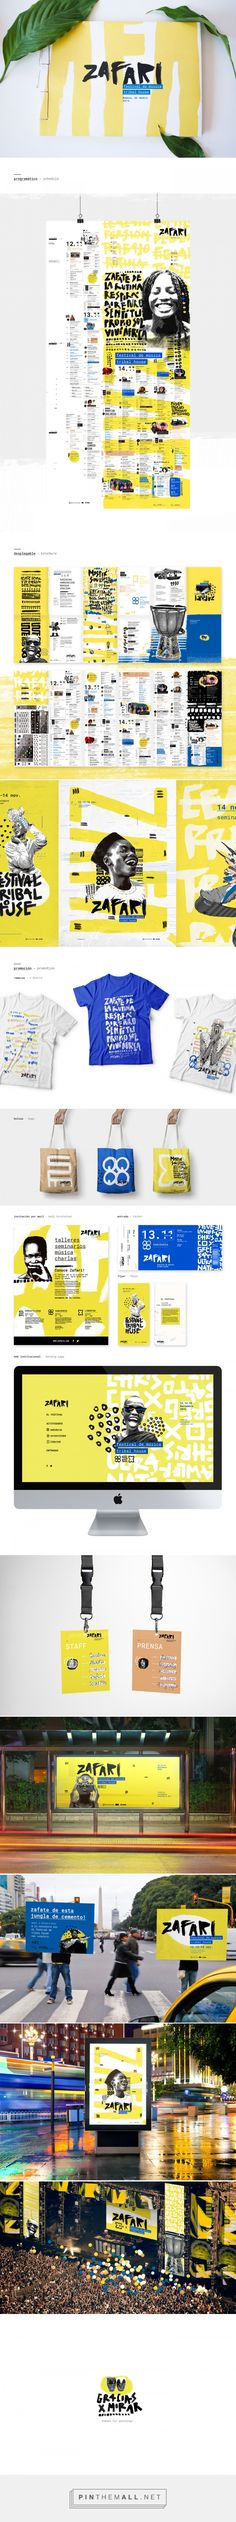 Zafari Festival Branding by Jennifer Reid | Fivestar Branding Agency – Design and Branding Agency & Curated Inspiration Gallery